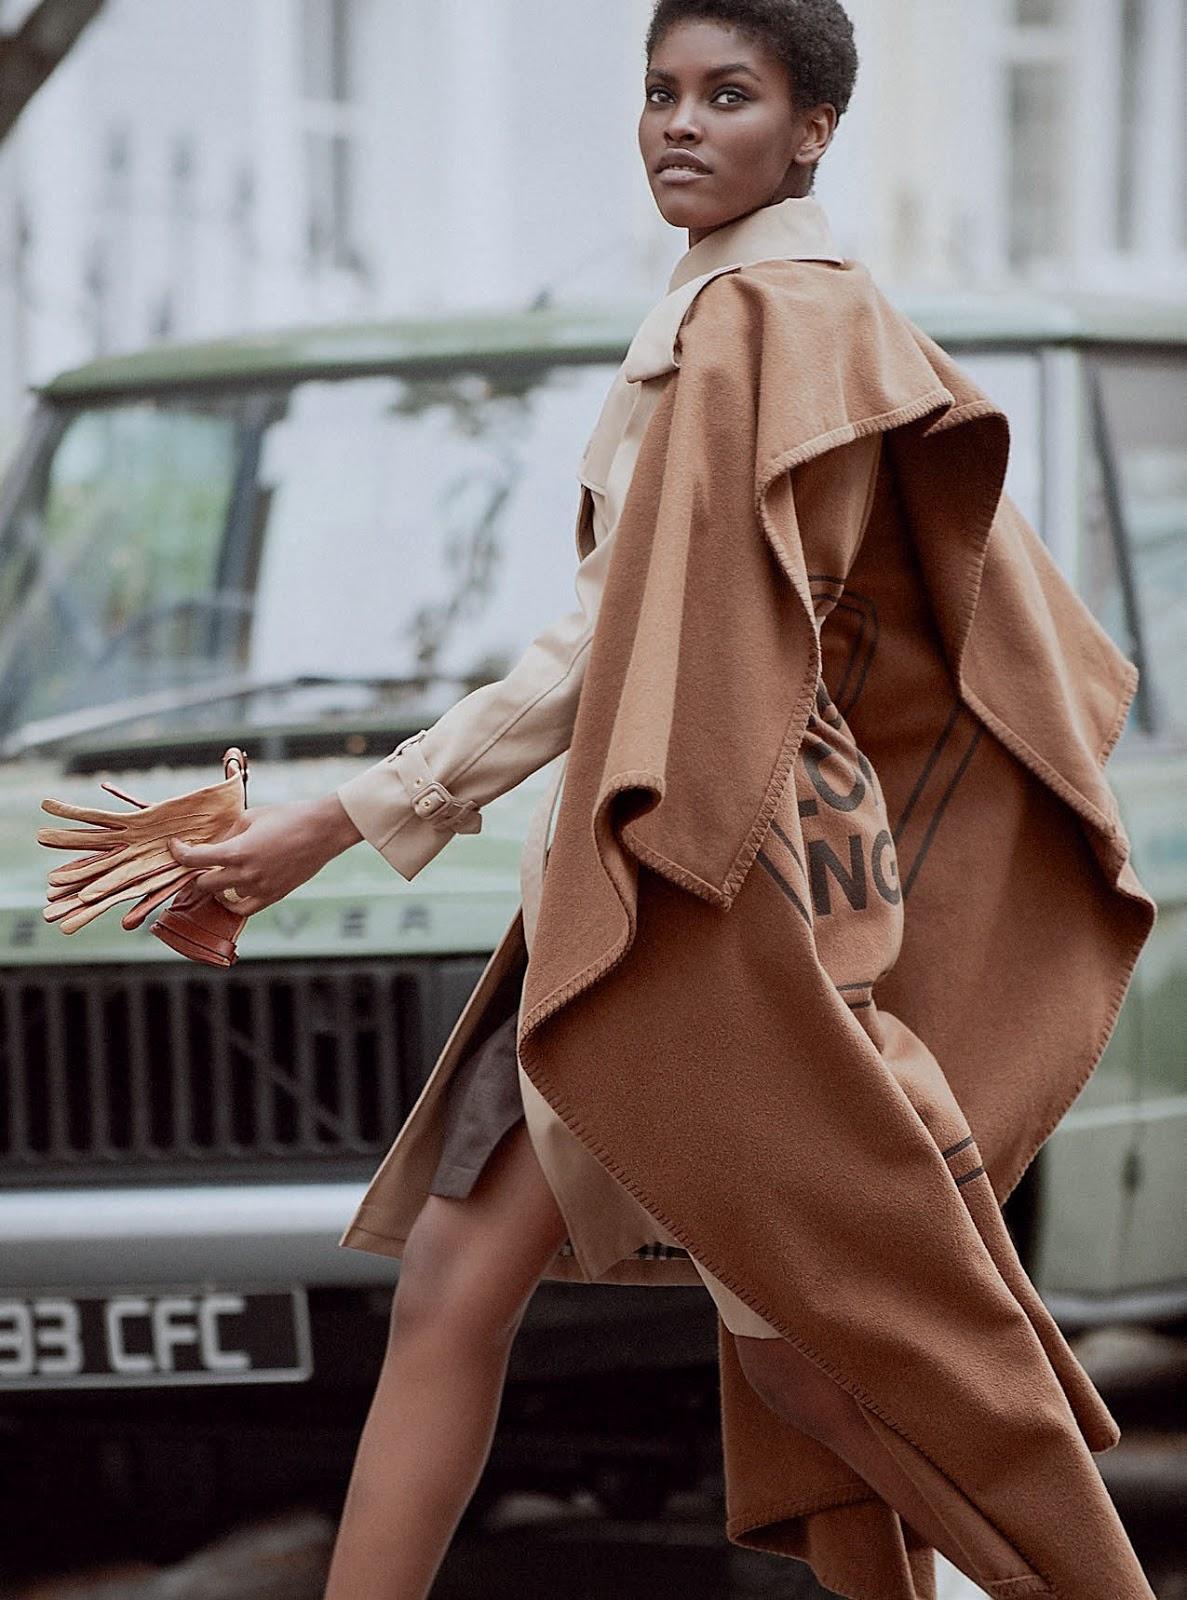 Amilna Estevao by Regan Cameron for Harper's Bazaar UK Sept 2019 (13).jpg